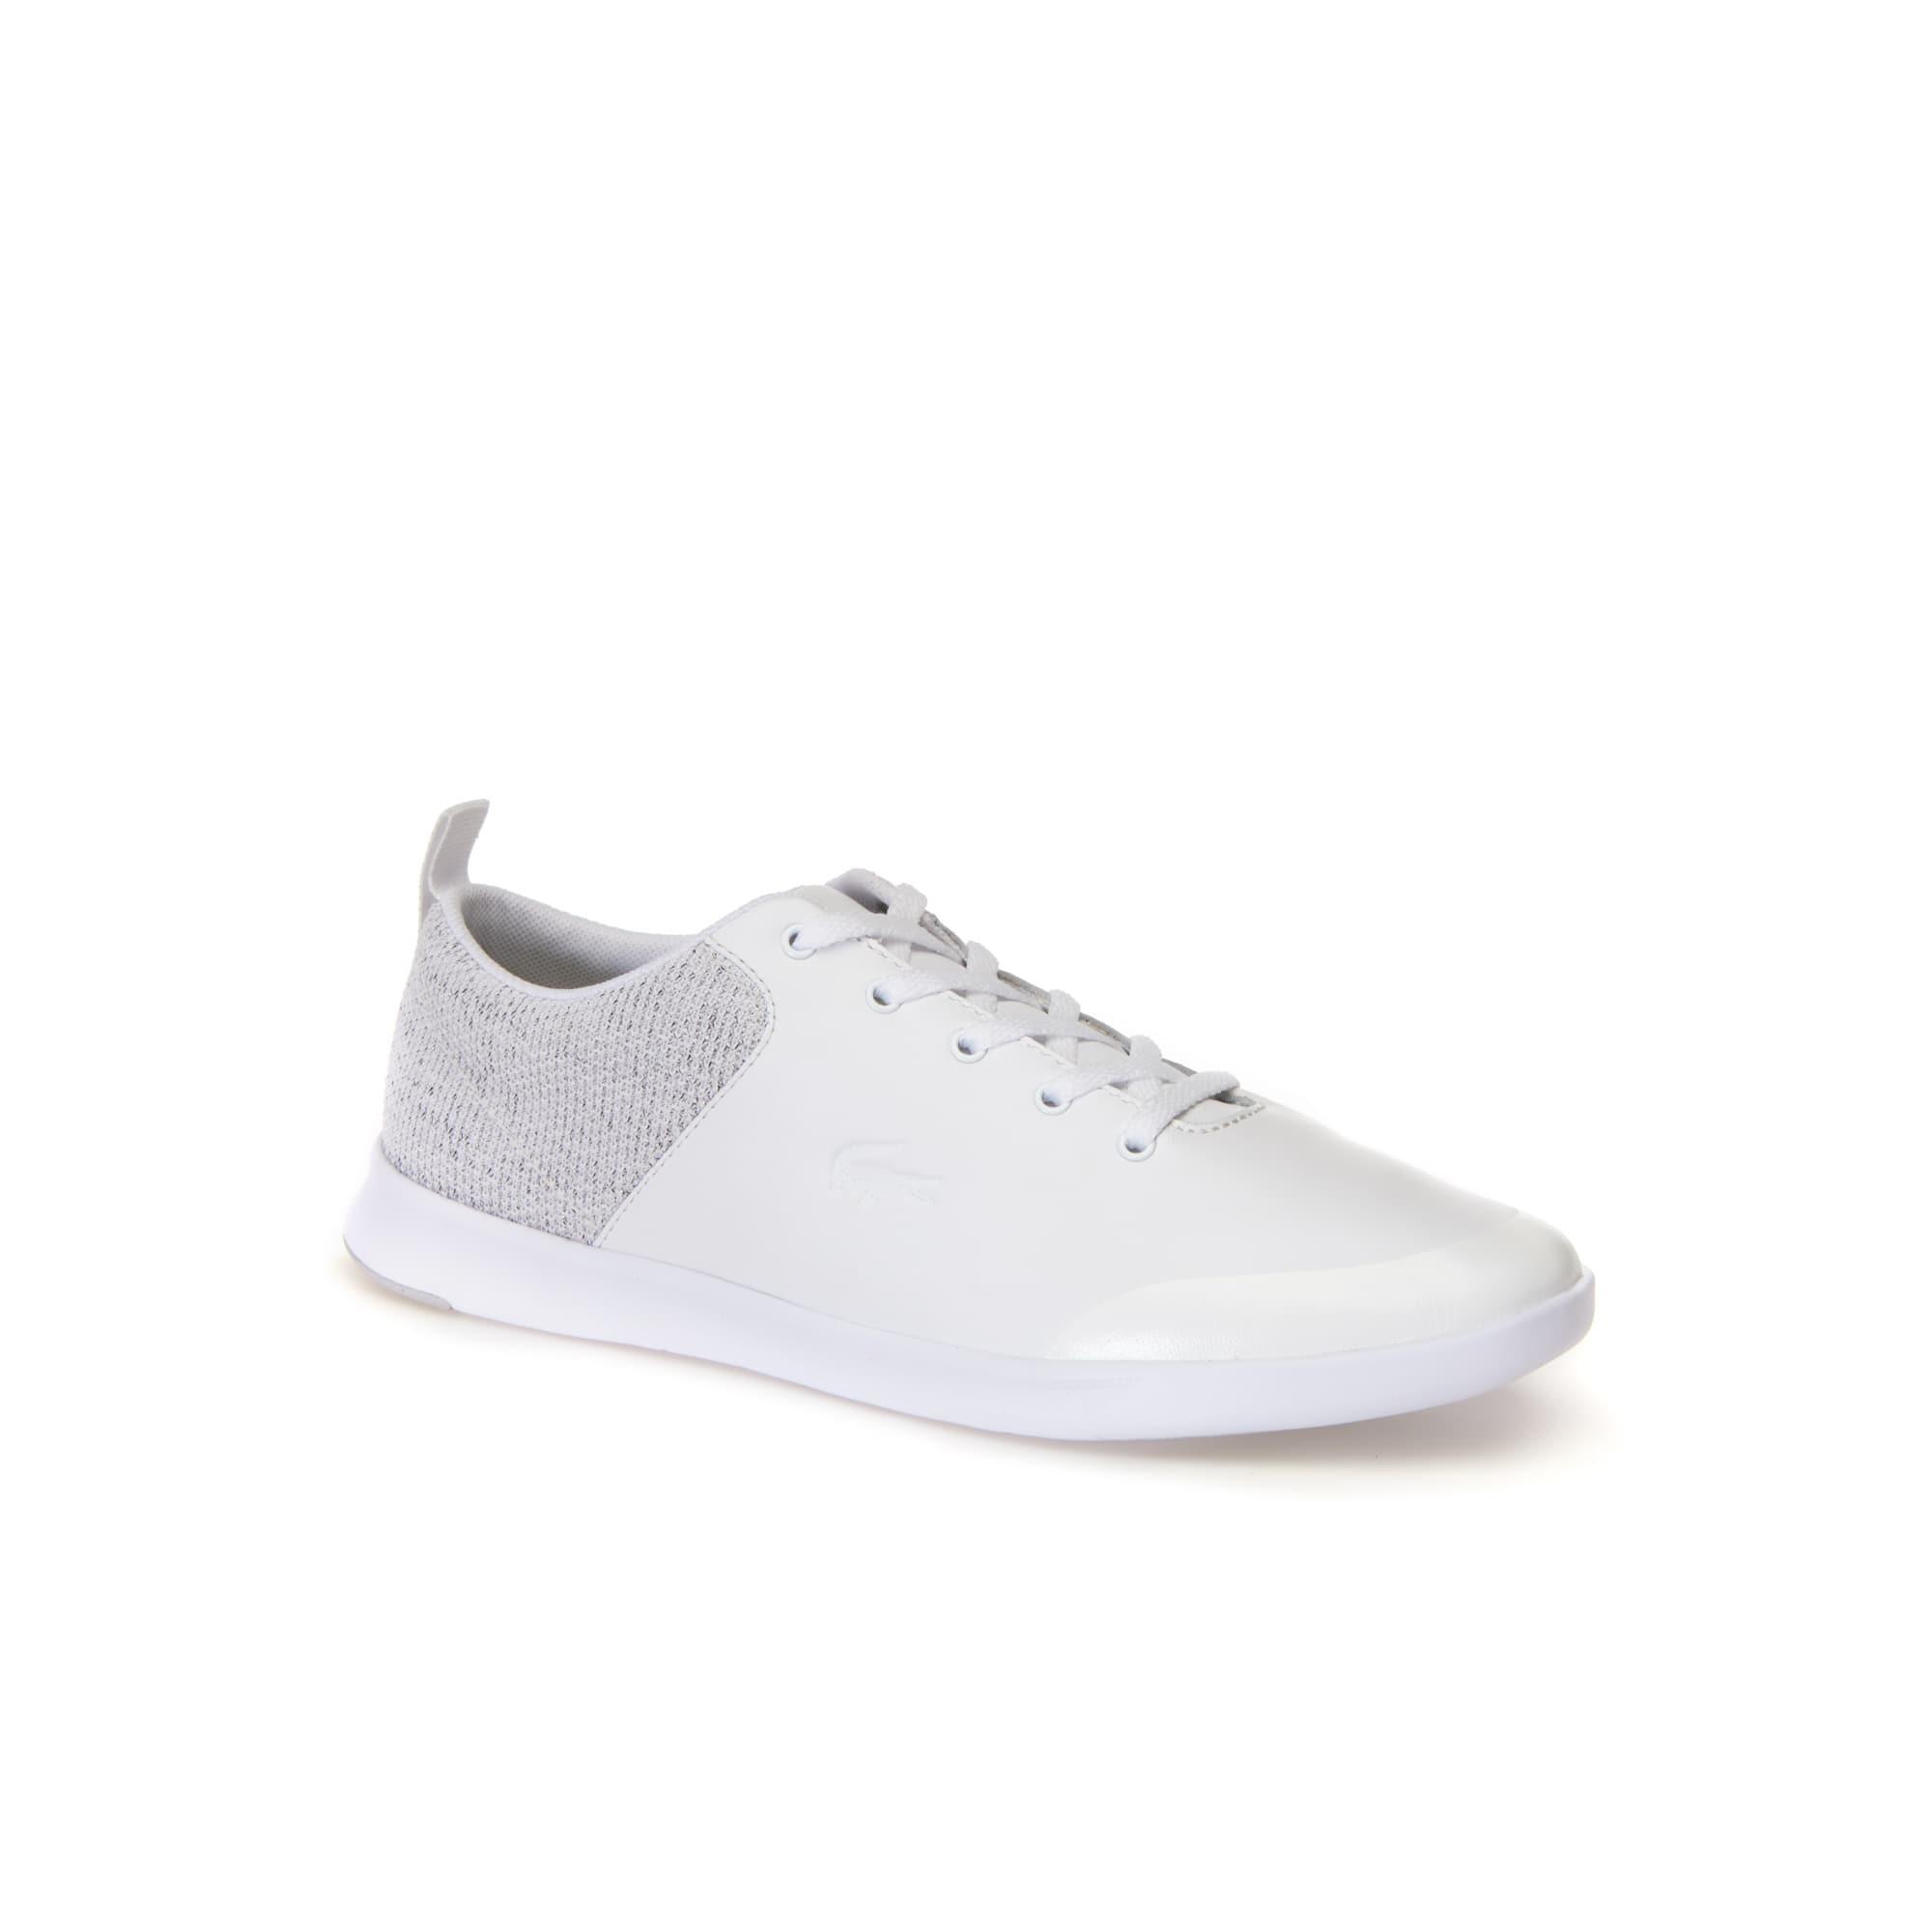 Sneakers Avenir lacées femme en cuir